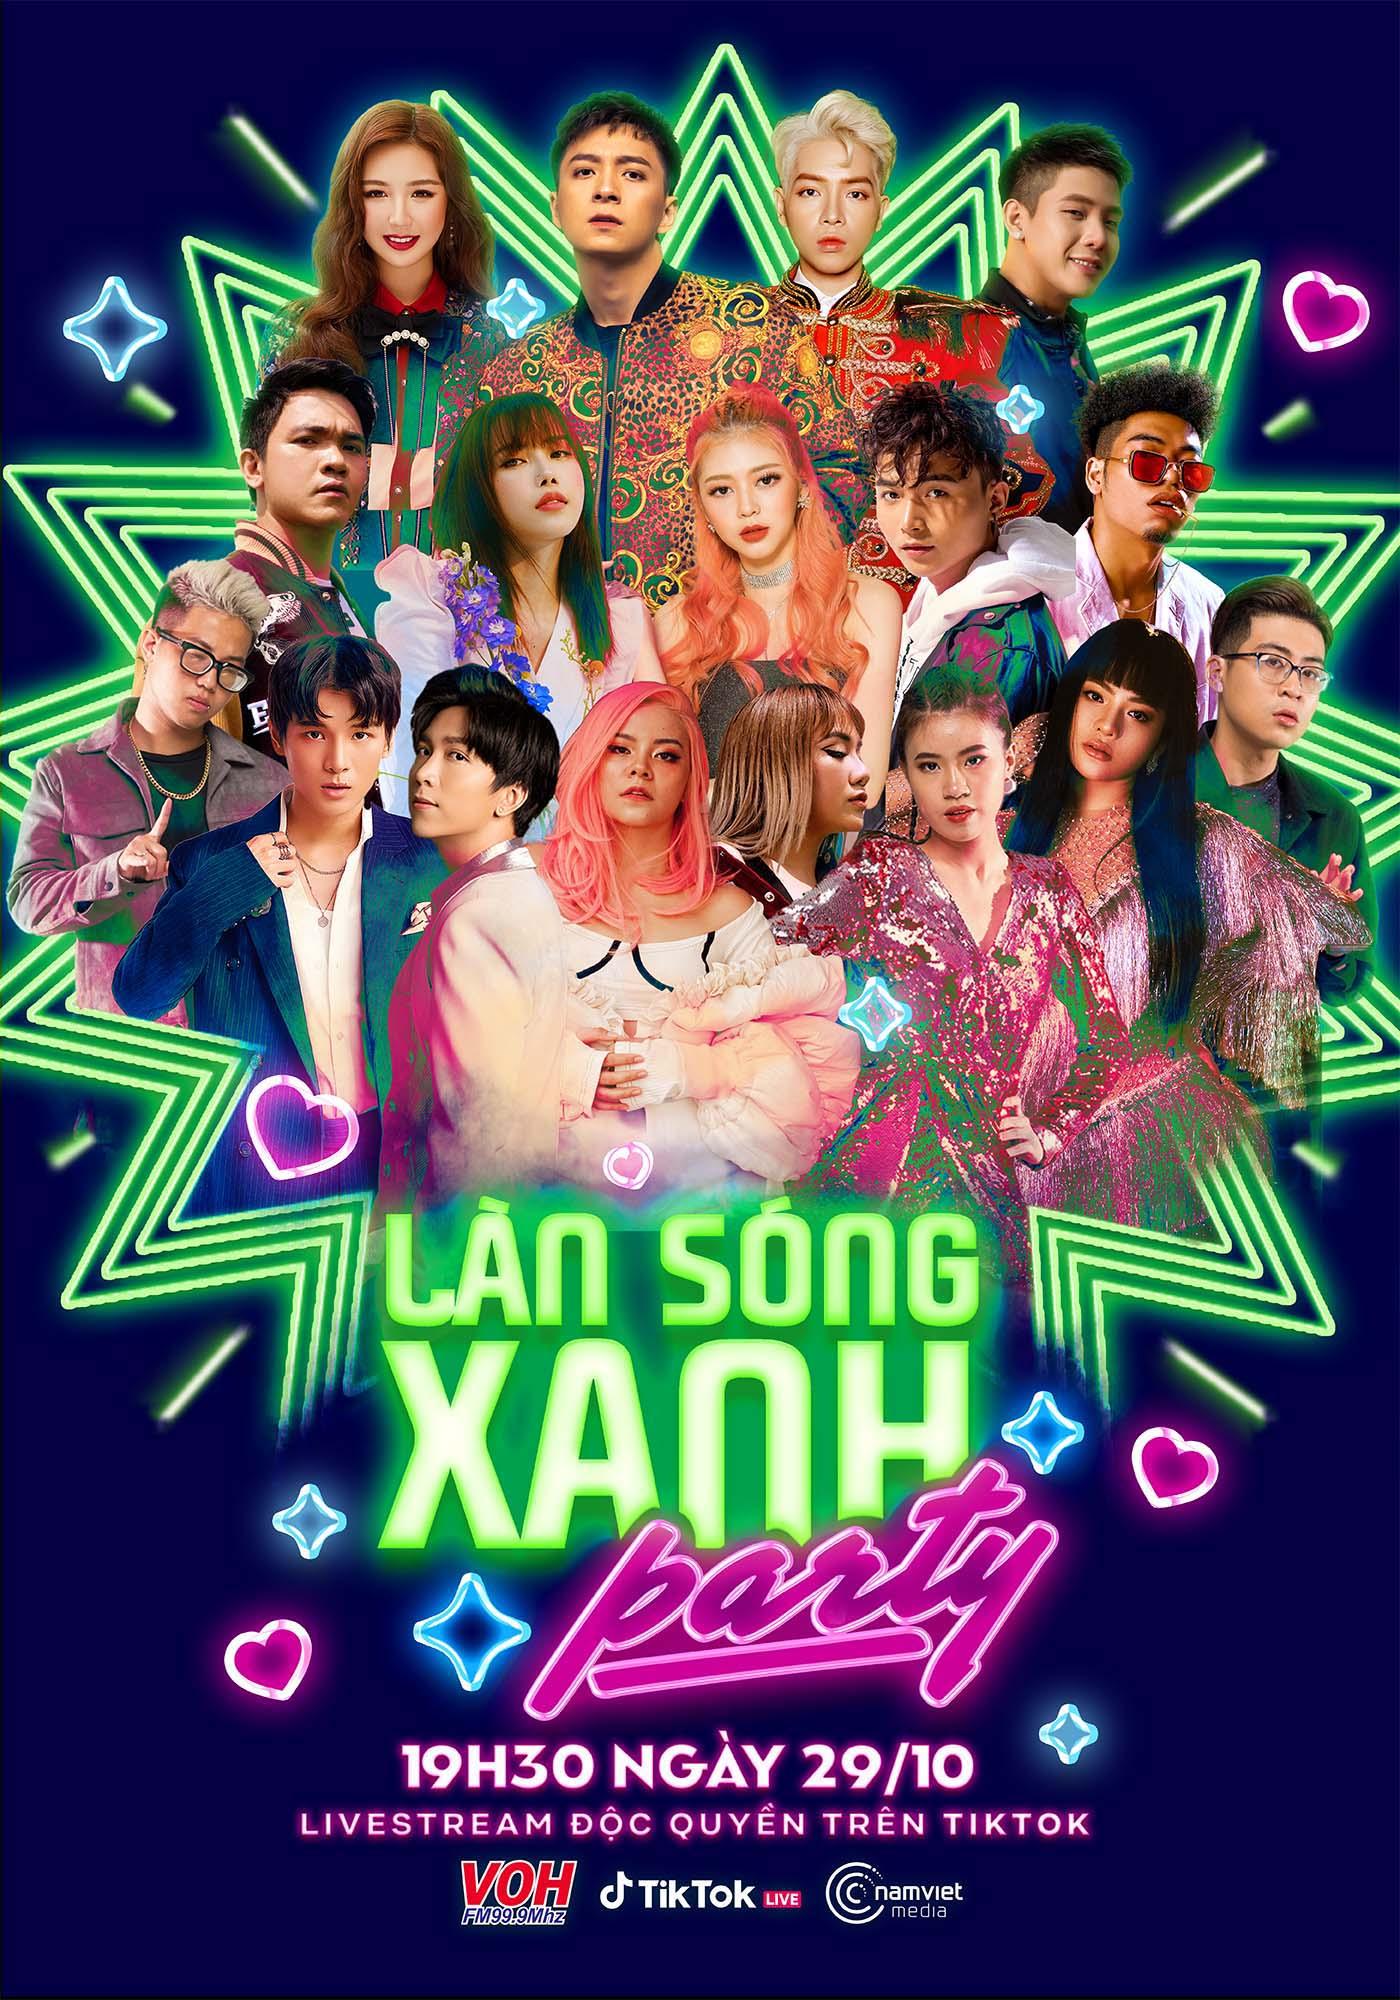 Lan-song-xanh-Party-01